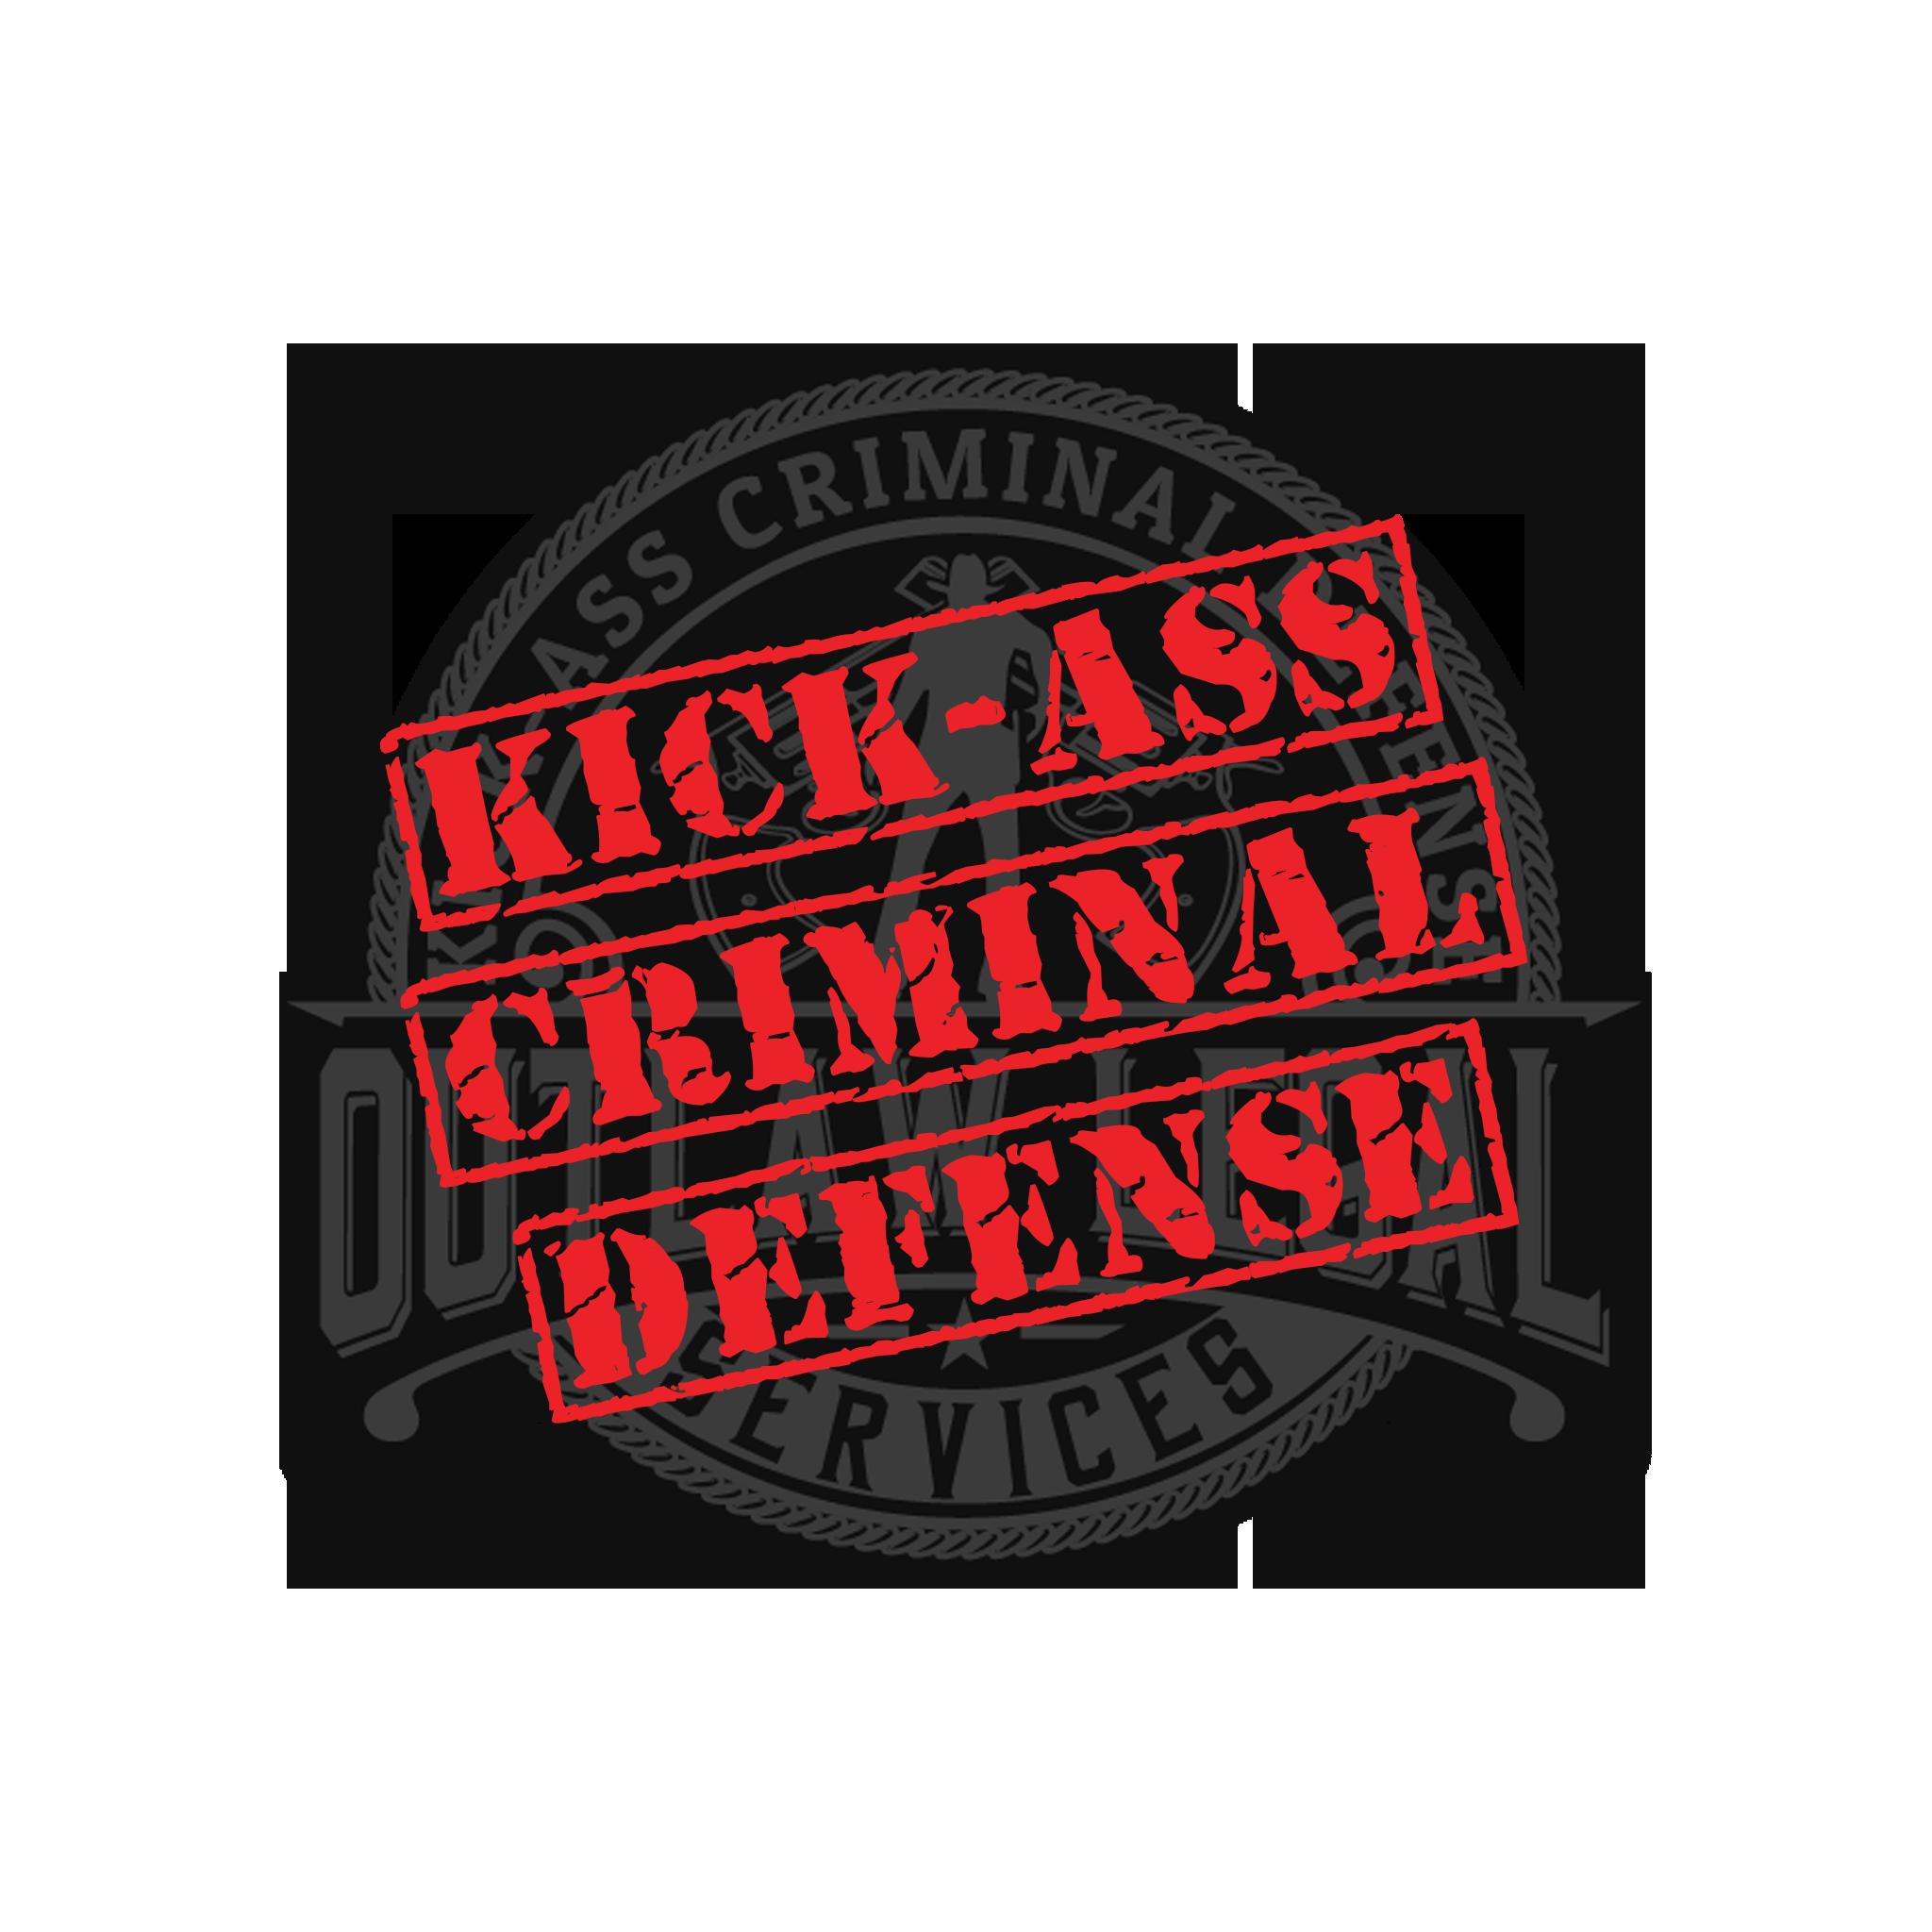 Utah Criminal Defense court proceedings. Utah's best criminal defense. Outlaw Legal Services. Serving Utah, Salt Lake City, Provo, Ogden, Logan, Vernal, St. George, West Valley City, Sandy. Utah Lawyer. Utah Attorney.